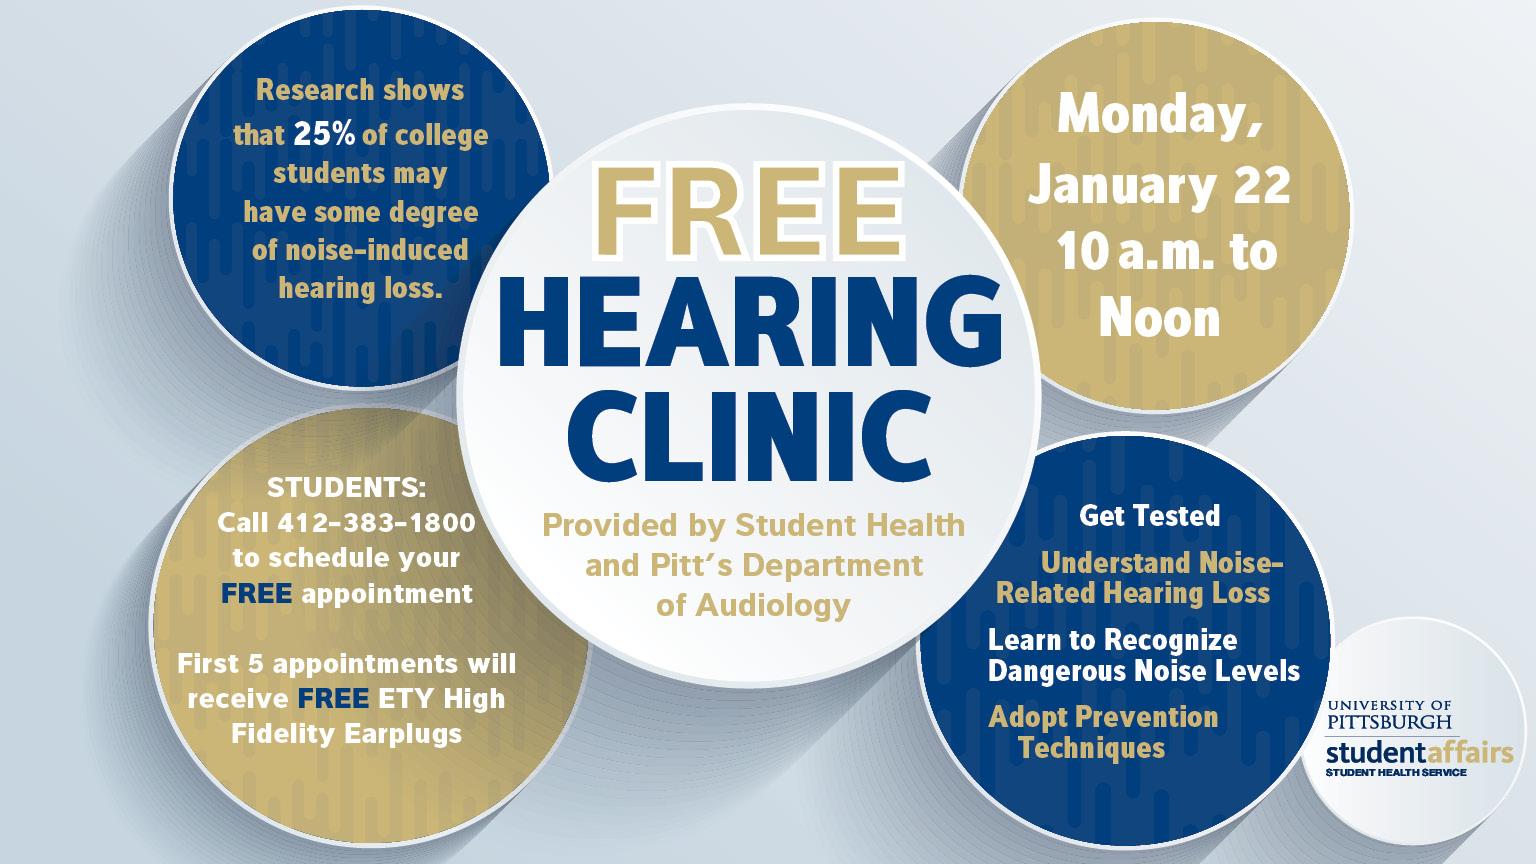 HearingClinicTVslide18_Jan22